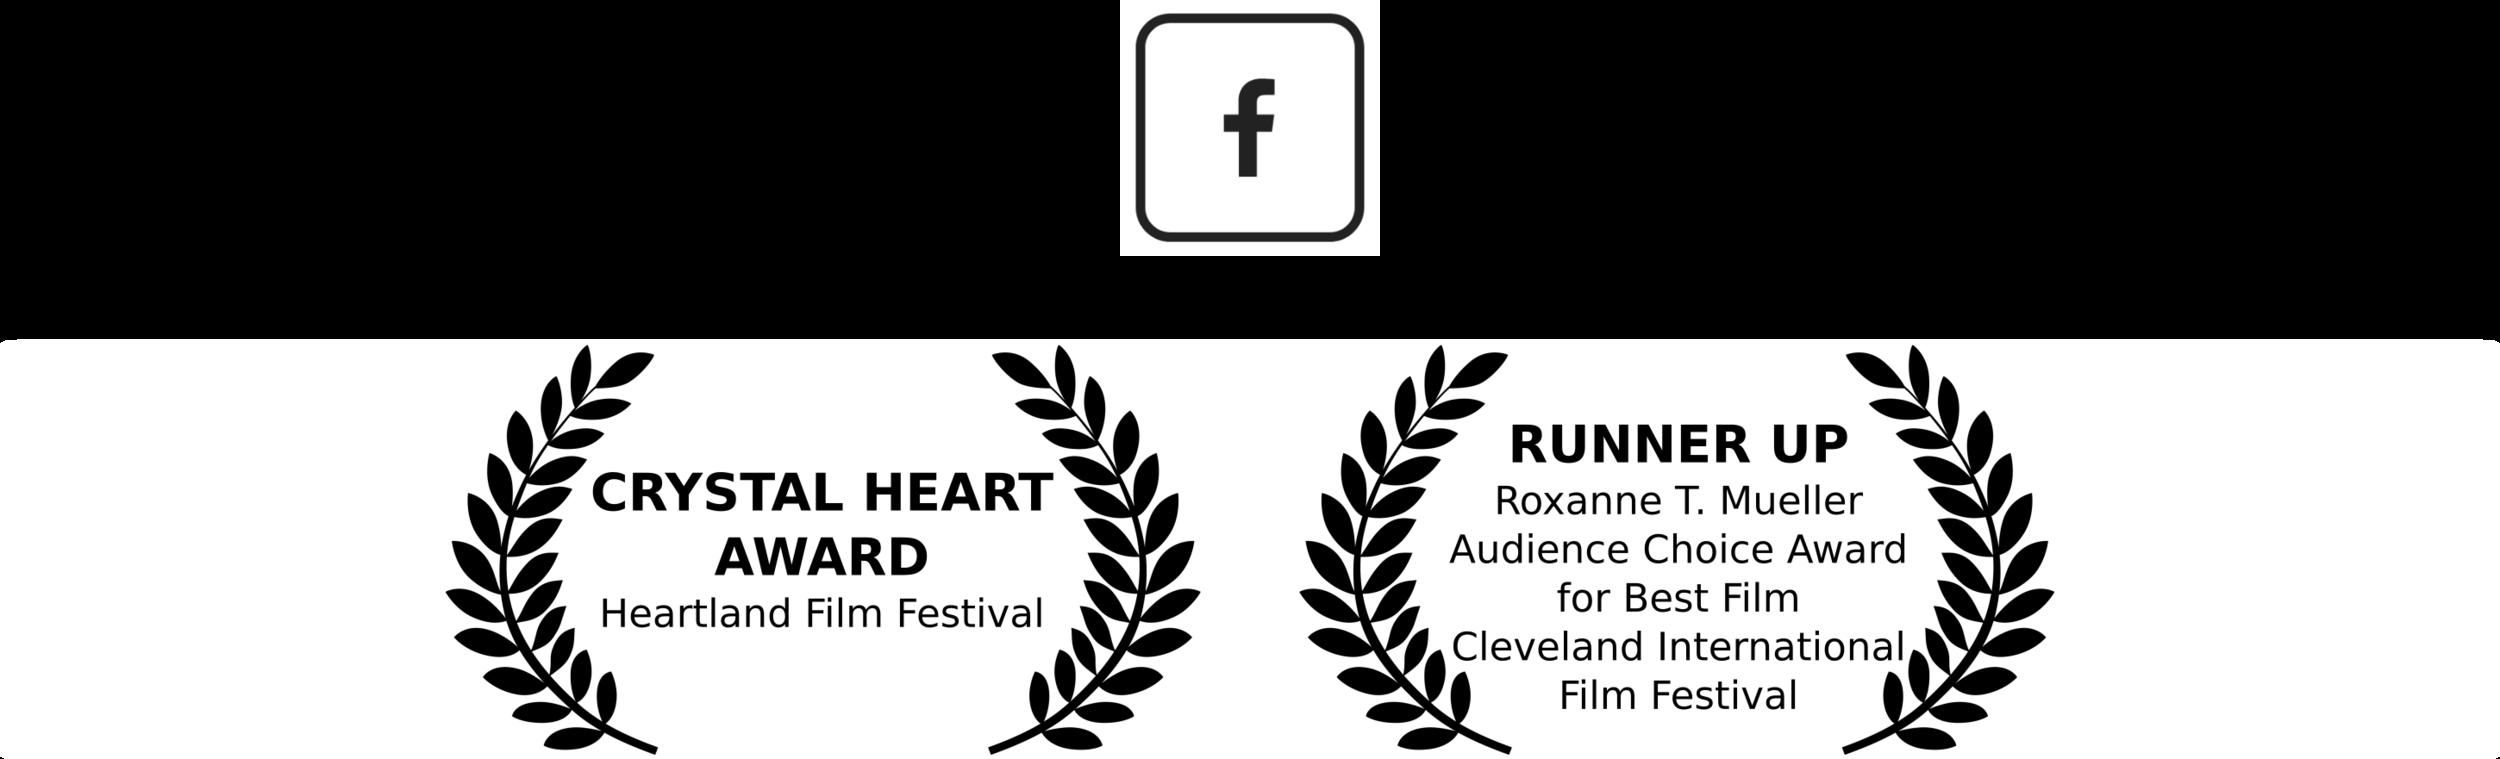 Facing Forward Awards w FB icon III.png